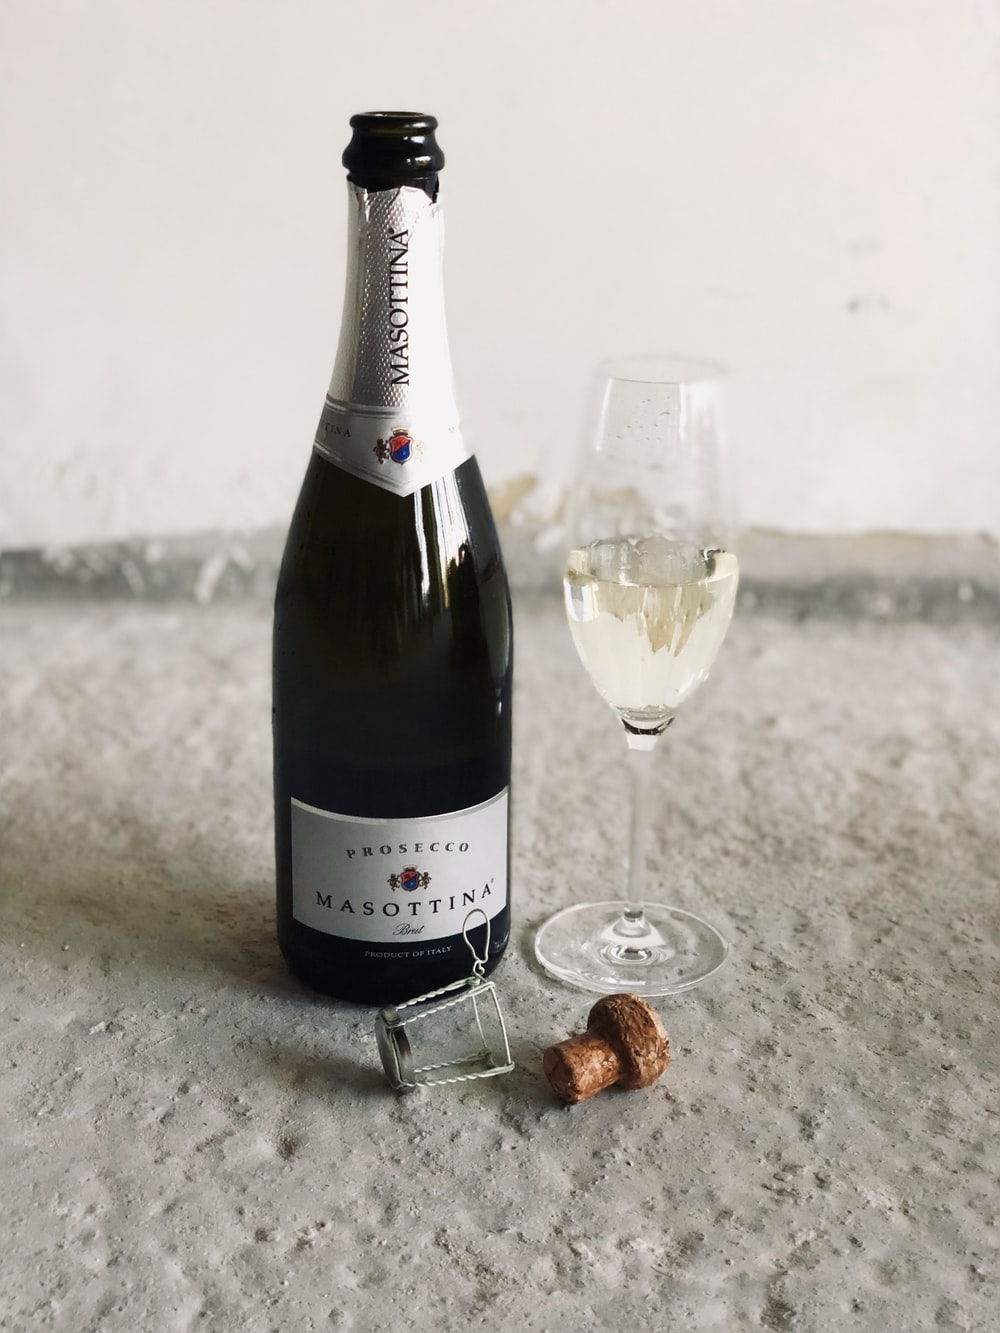 black champagne bottle beside champagne flute